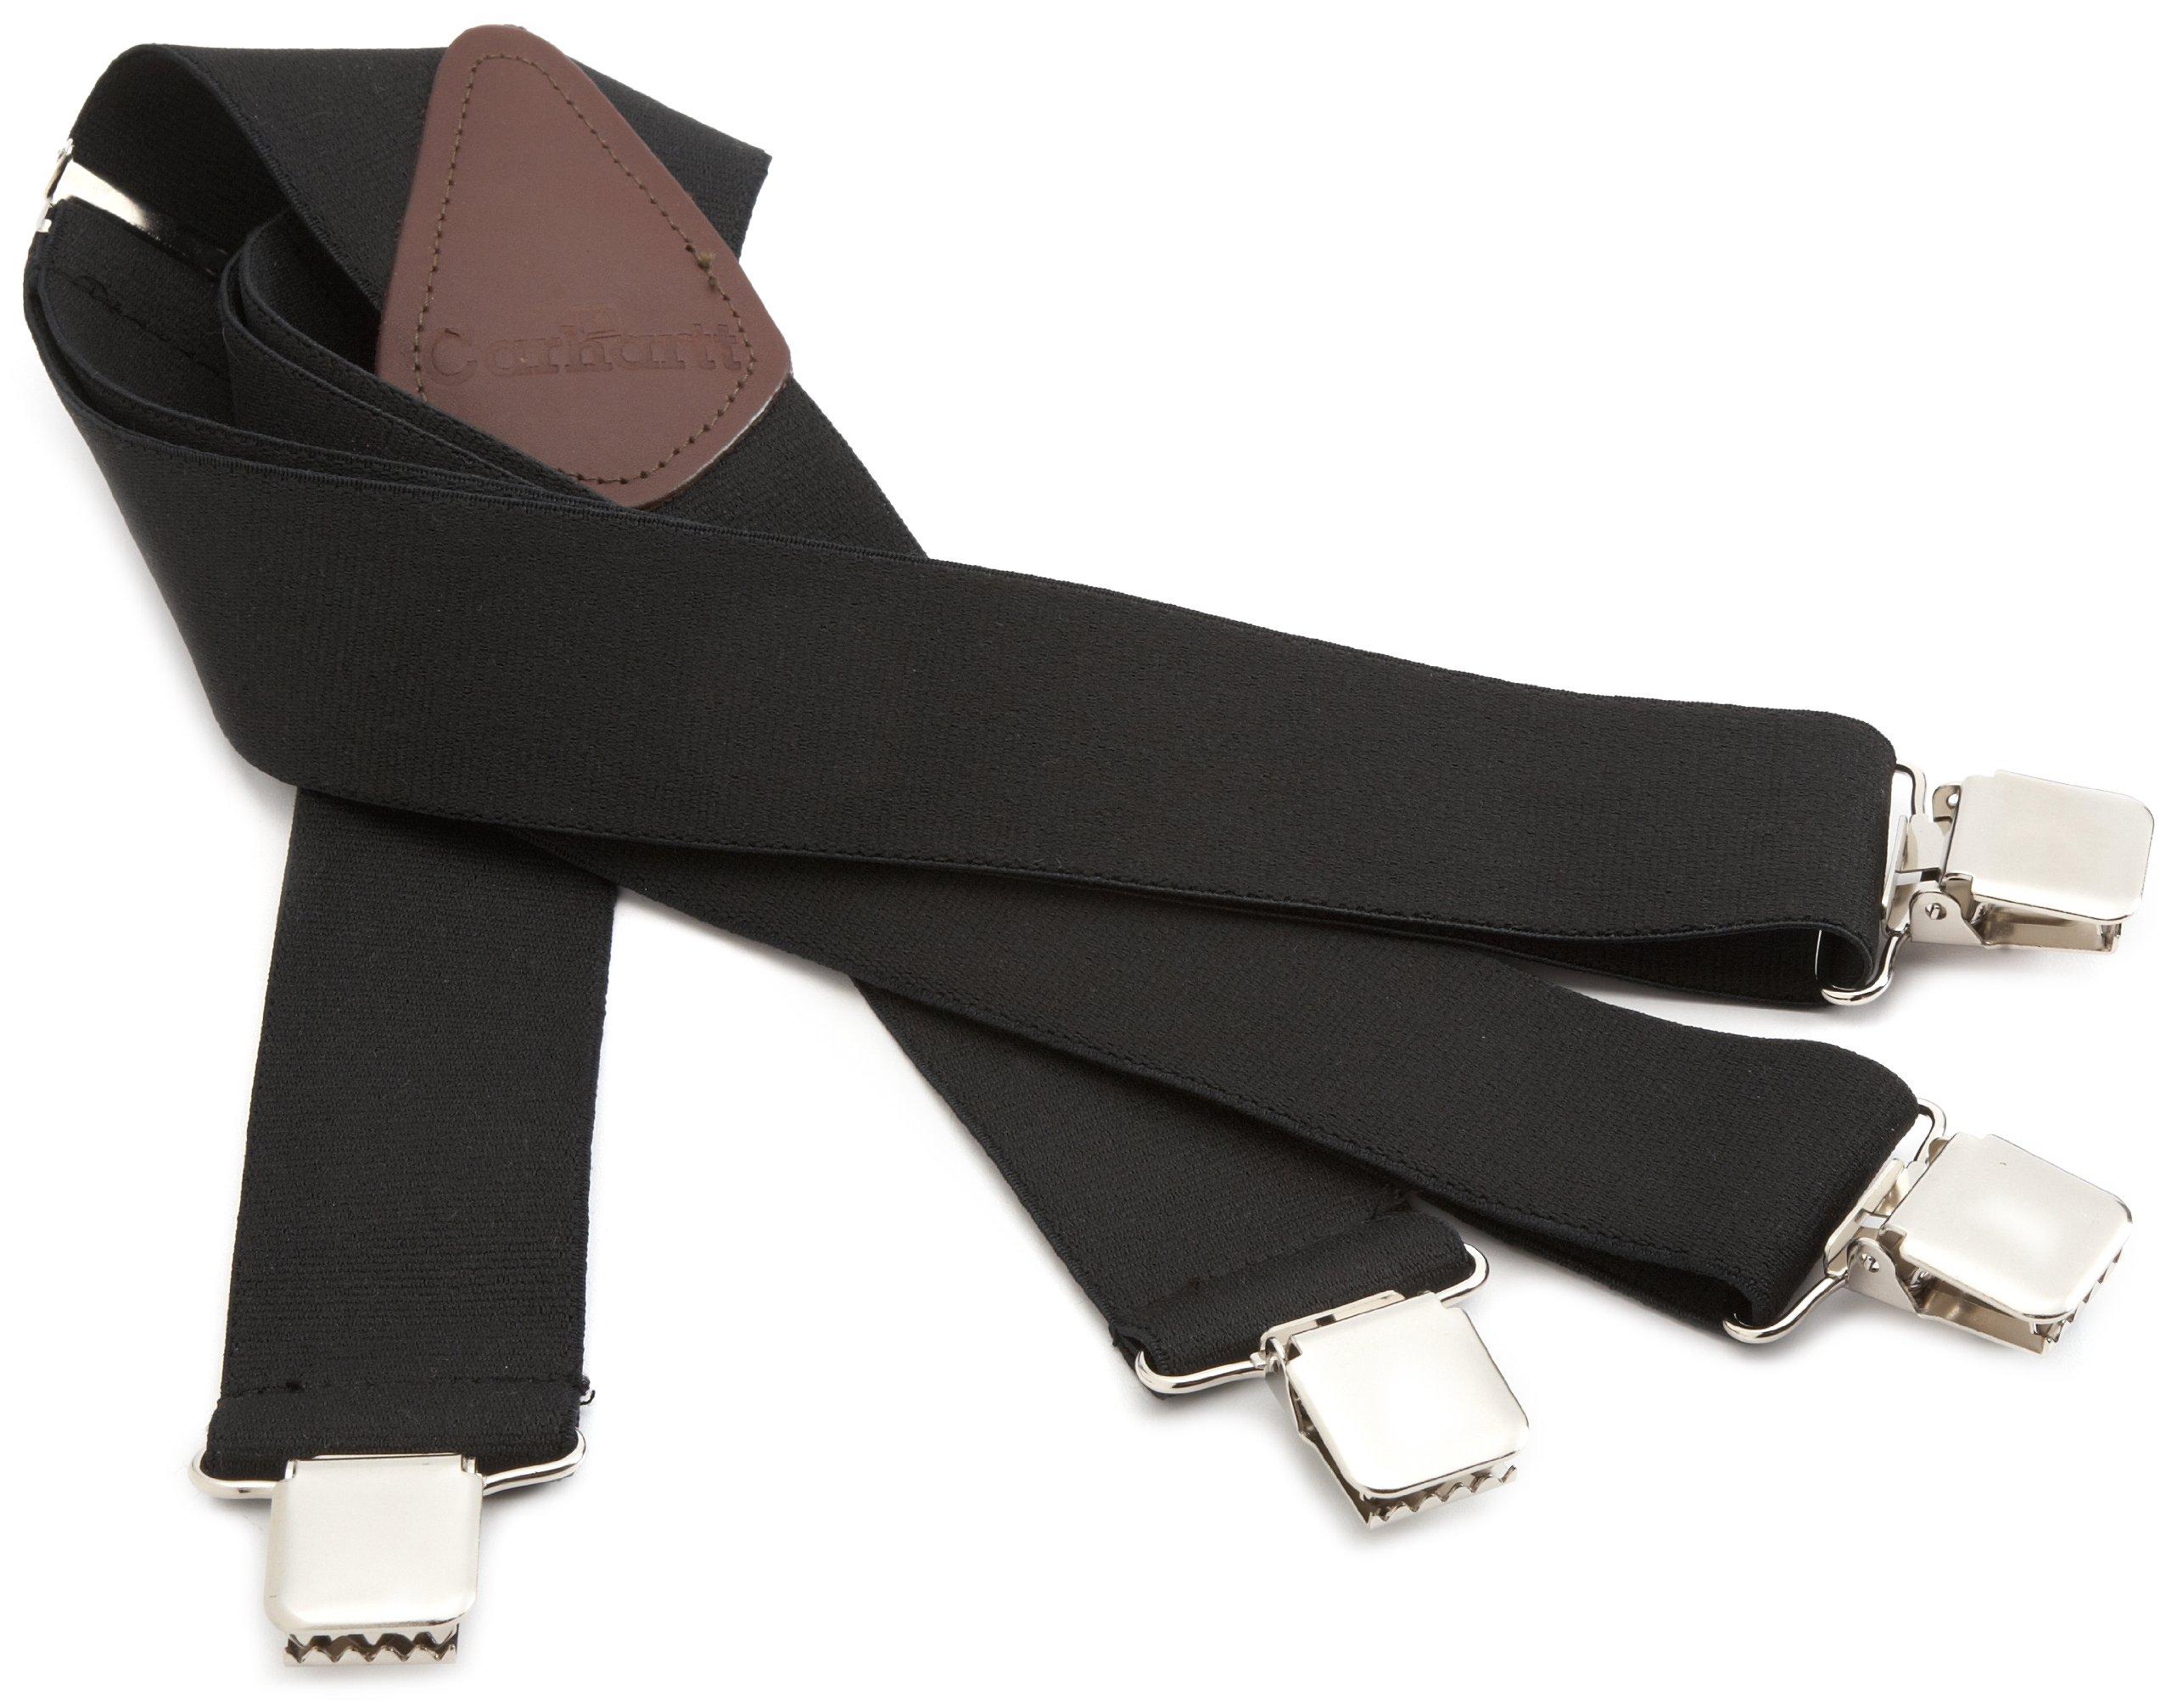 Carhartt Men's Utility Suspender,Black,One Size